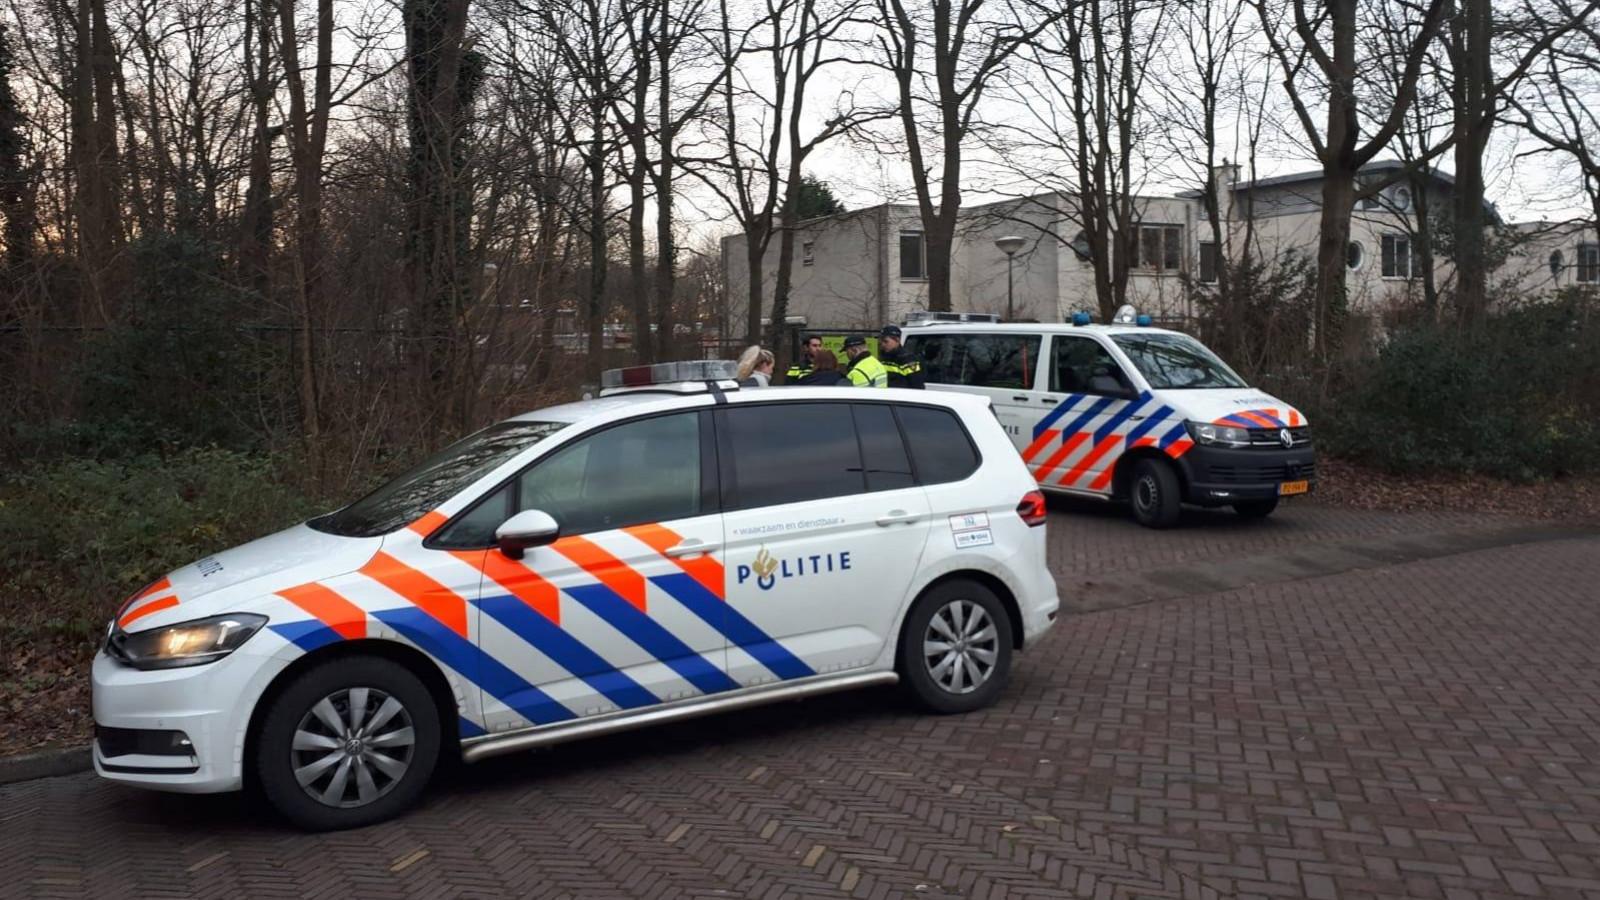 Politie IJmond